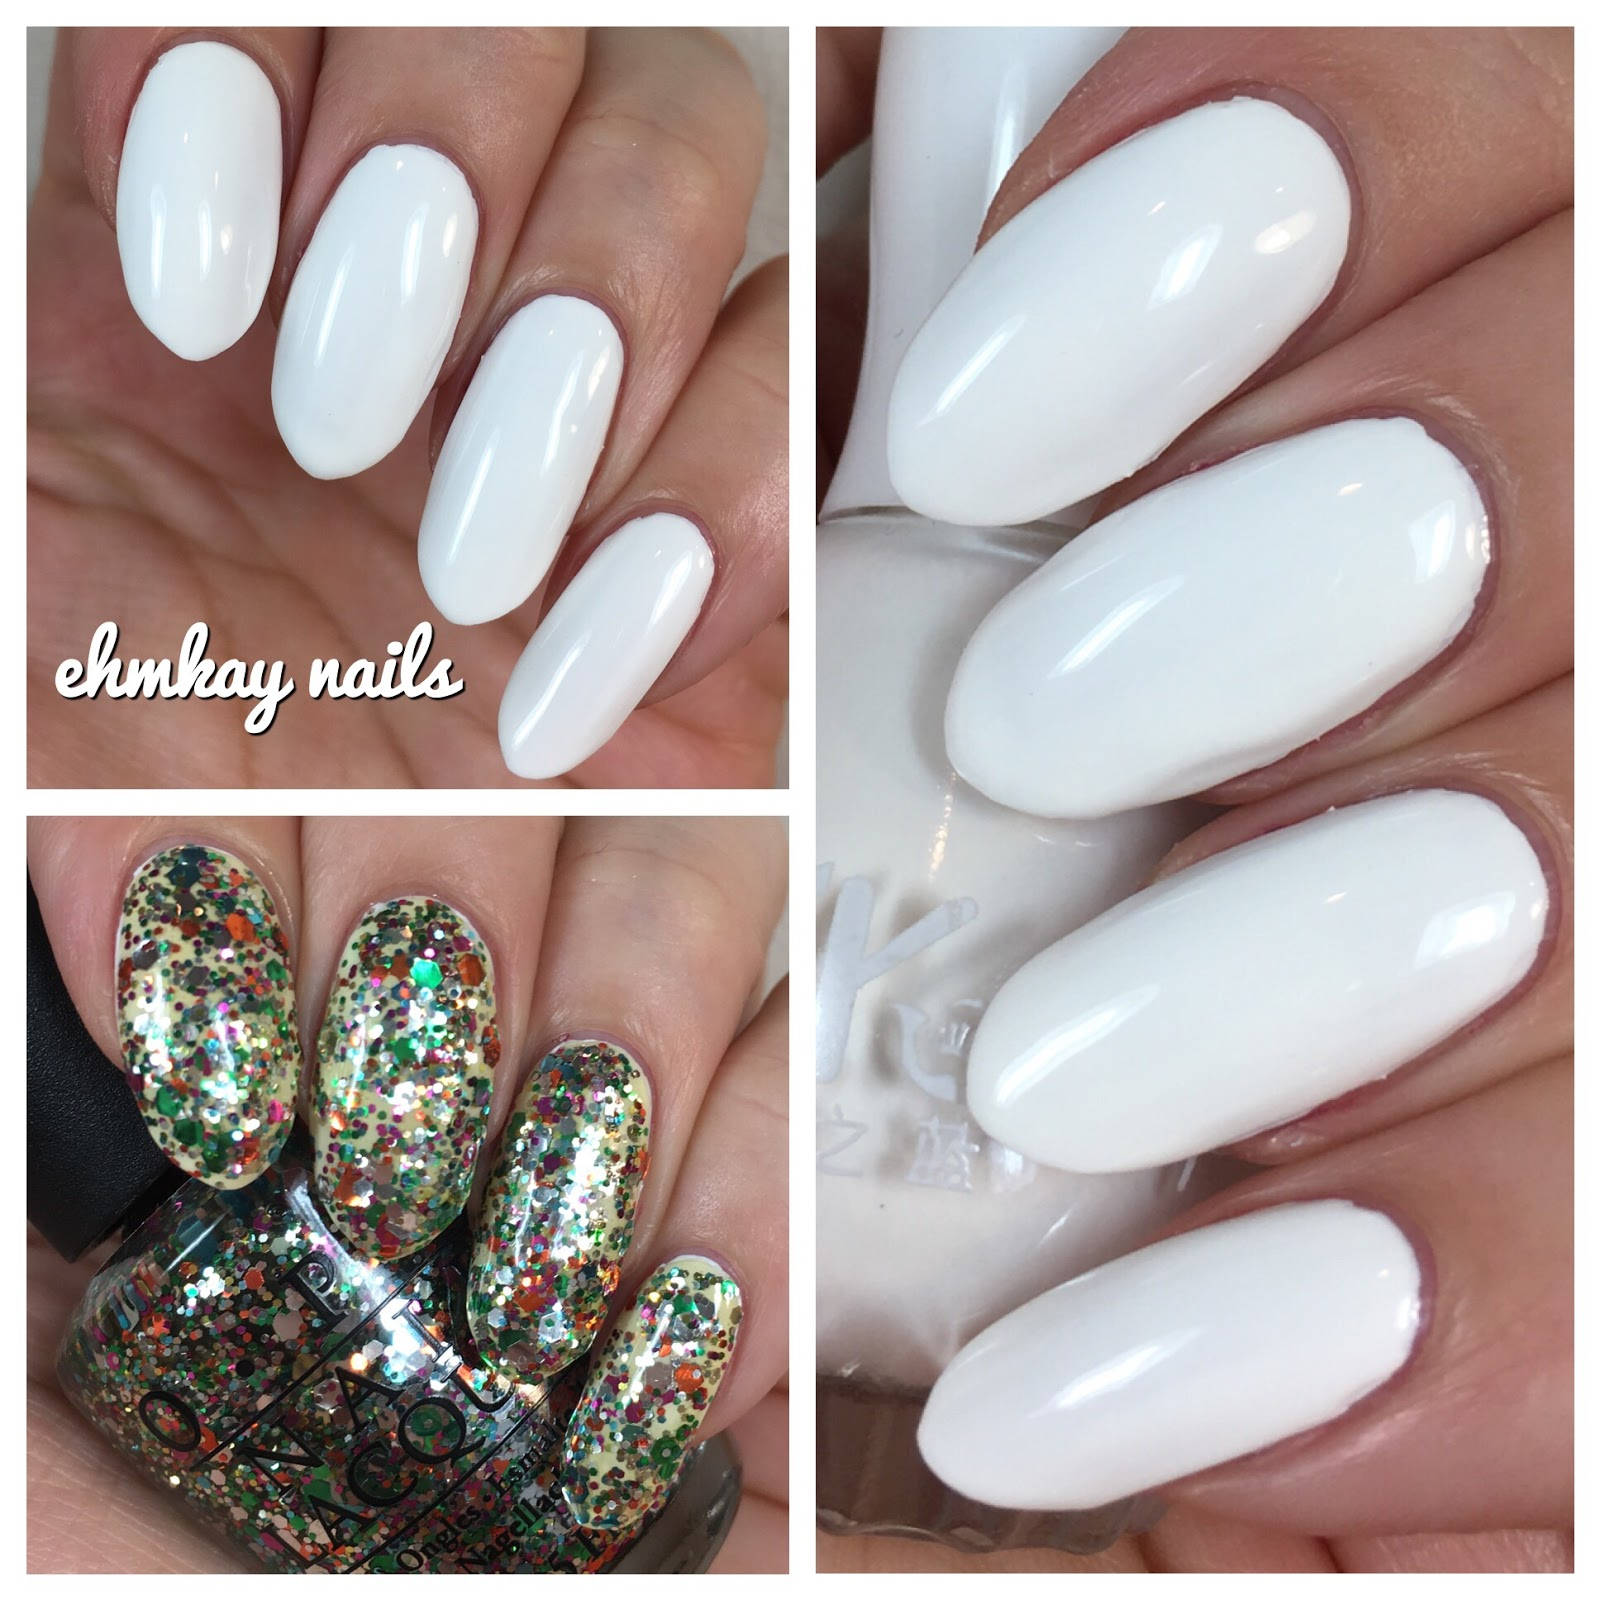 ehmkay nails: Born Pretty Peel Off White Nail Polish Review